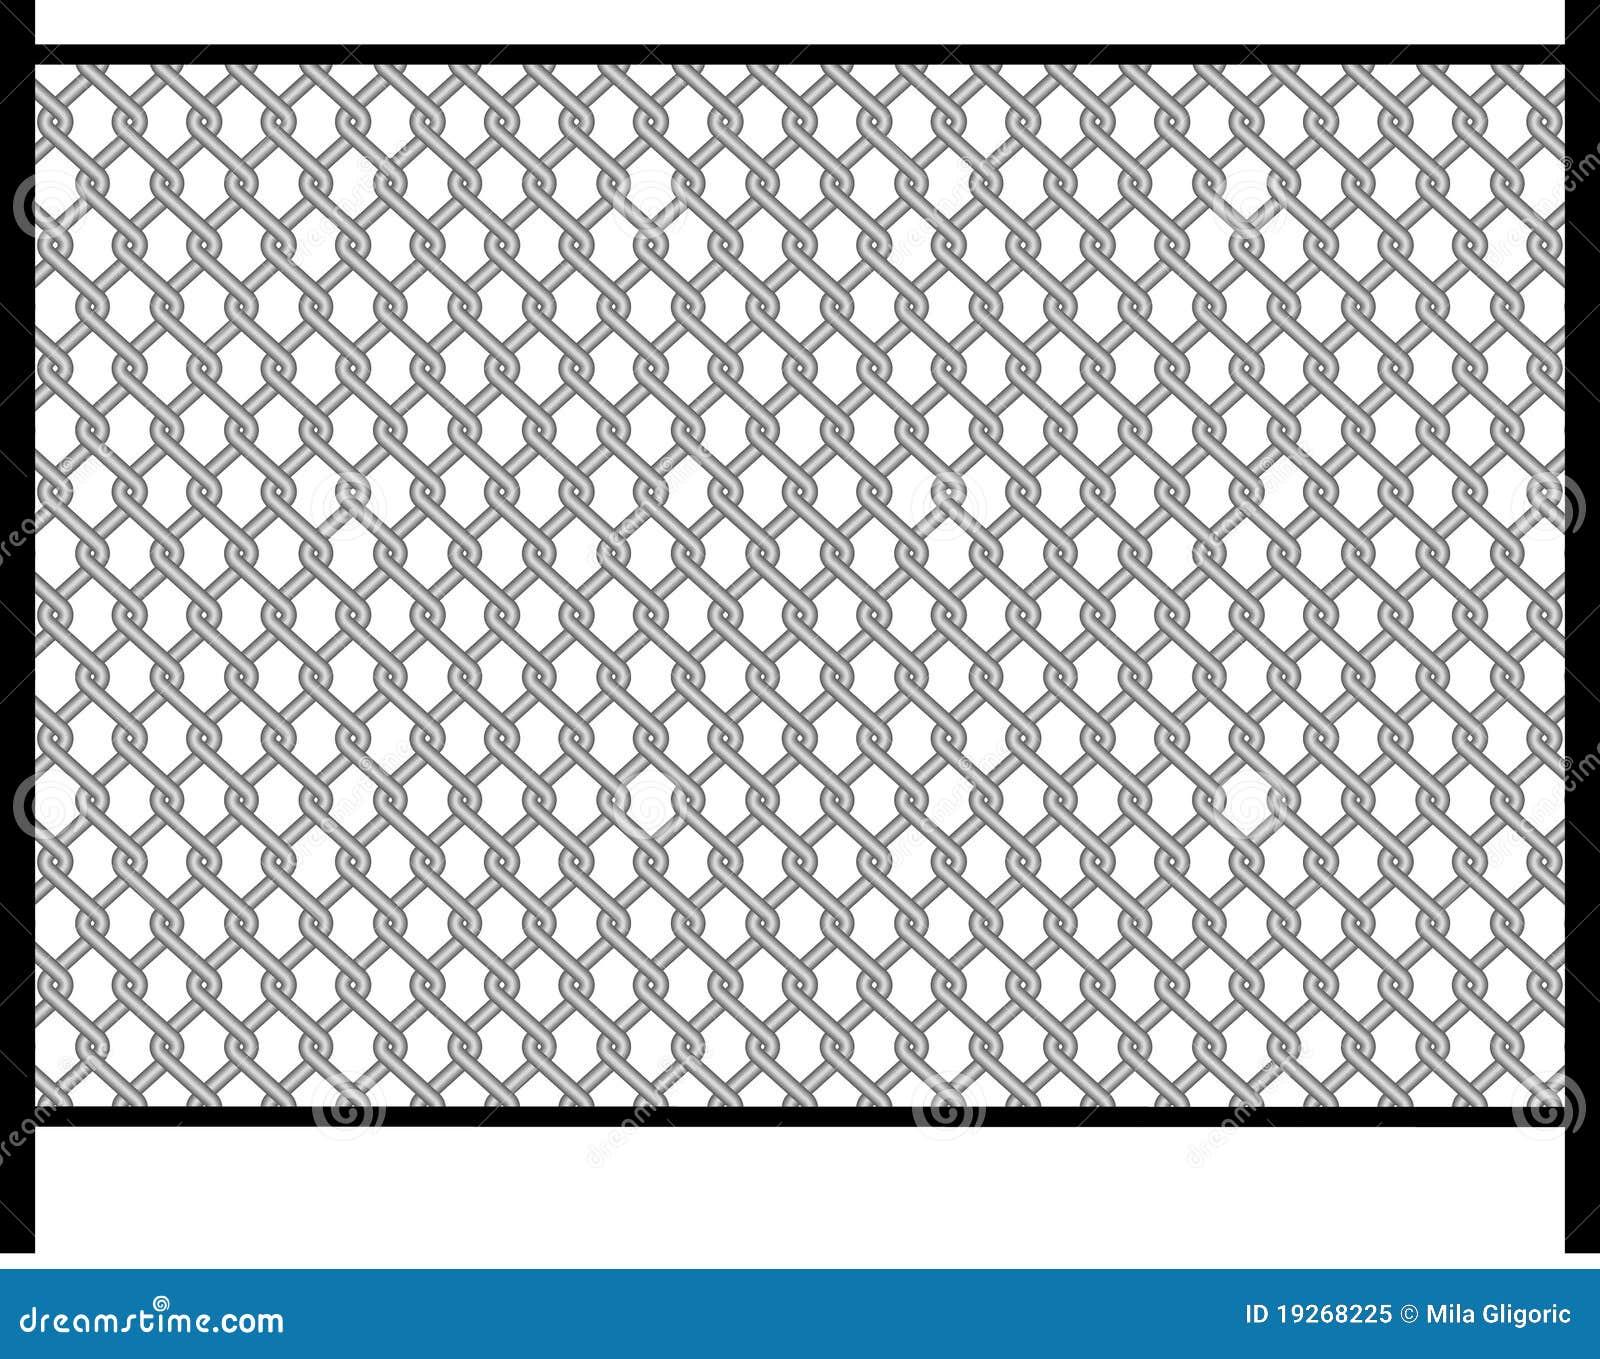 zaun draht design home design ideen. Black Bedroom Furniture Sets. Home Design Ideas